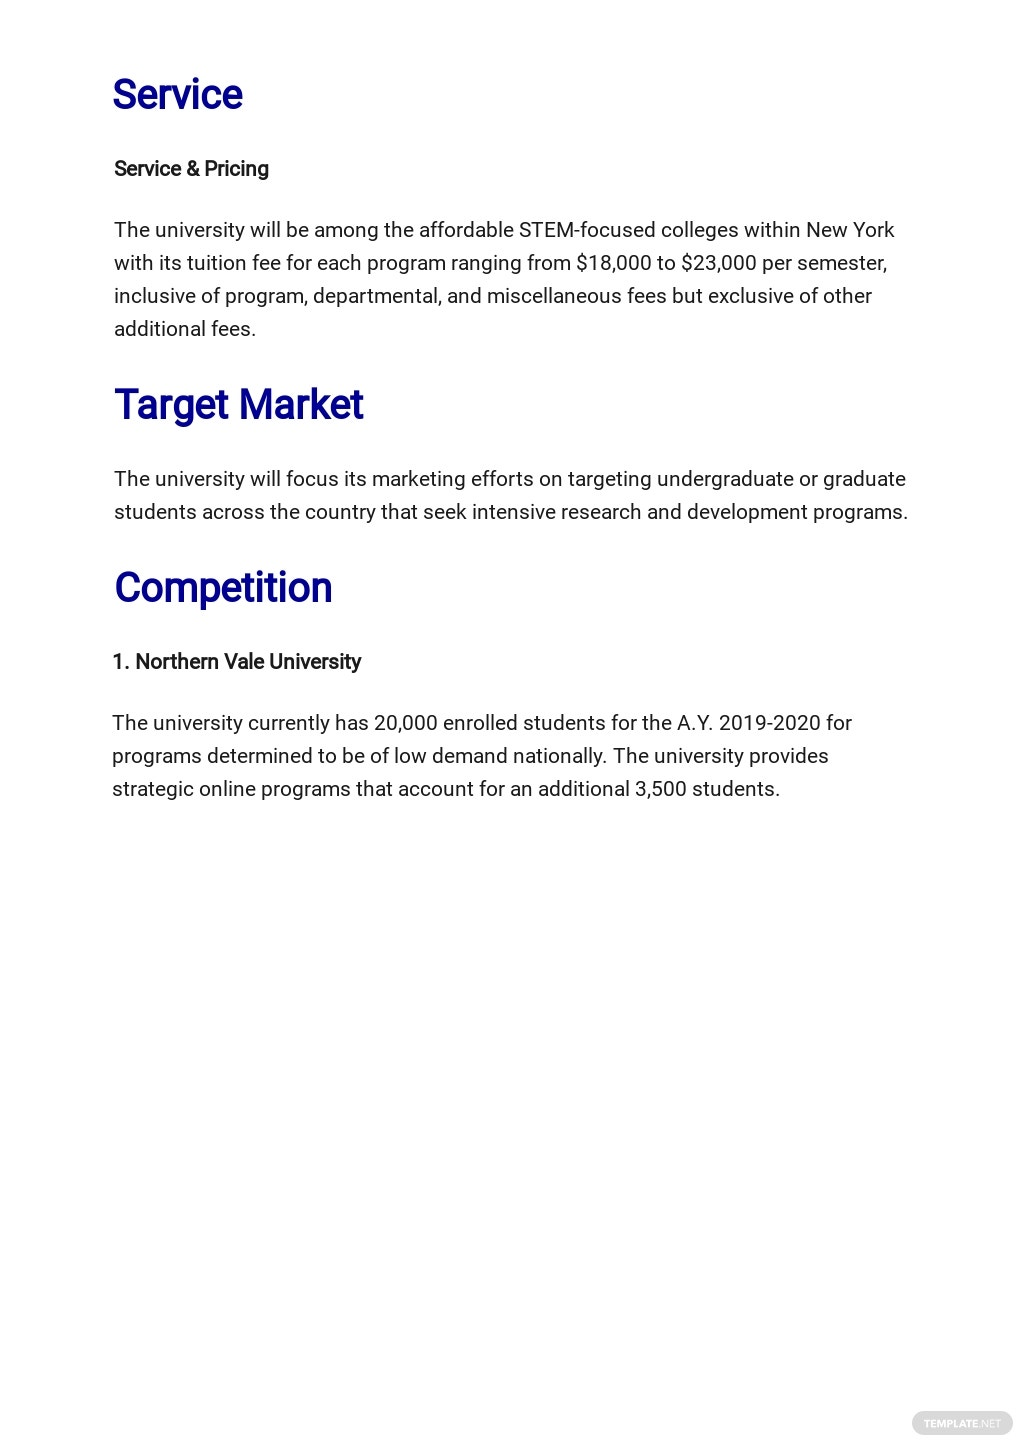 Free Blank University Business Plan Template 2.jpe